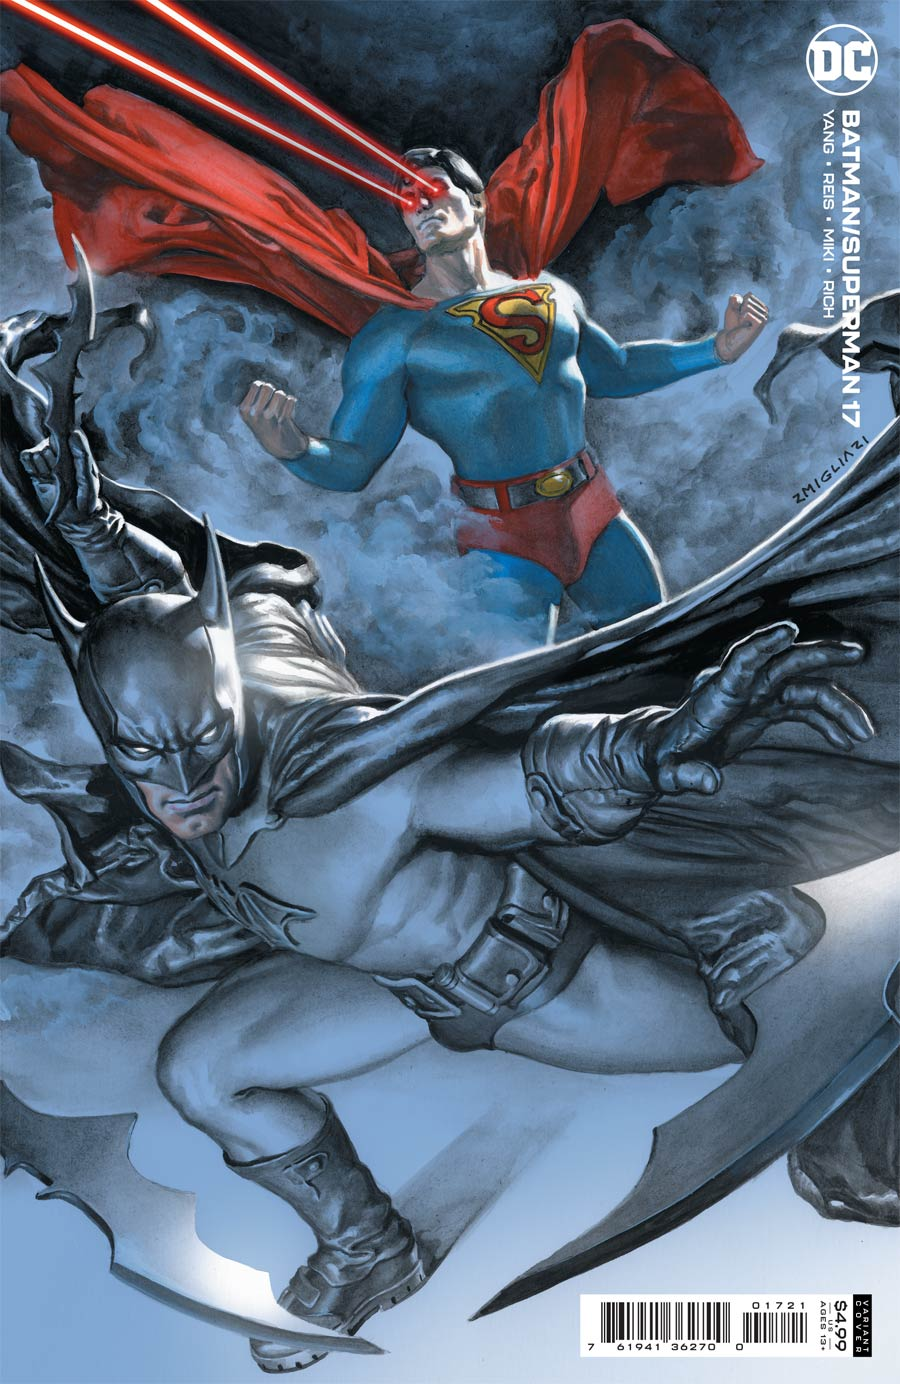 Batman Superman Vol 2 #17 Cover B Variant Rodolfo Migliari Card Stock Cover